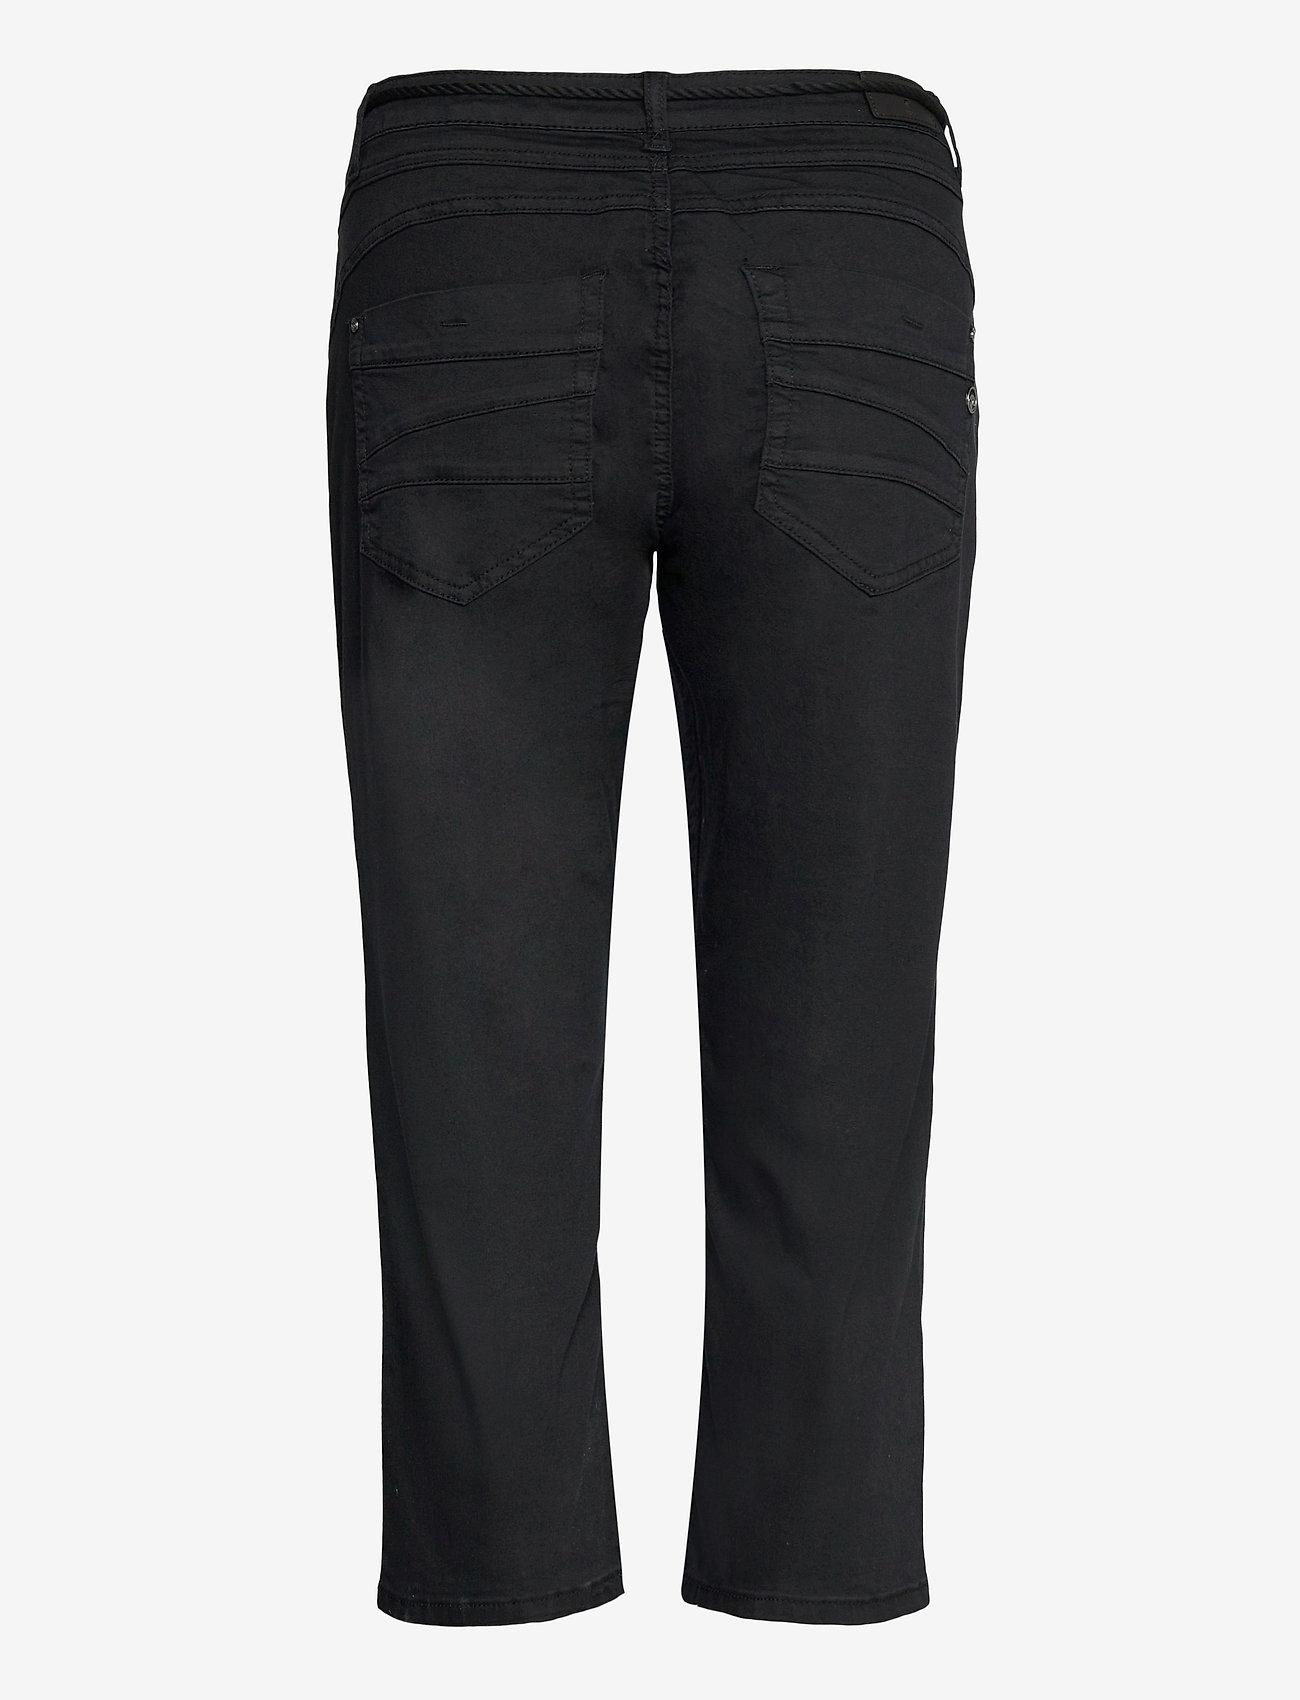 Cream - CRVava Pant 3/4 - Coco Fit - straight regular - pitch black - 1